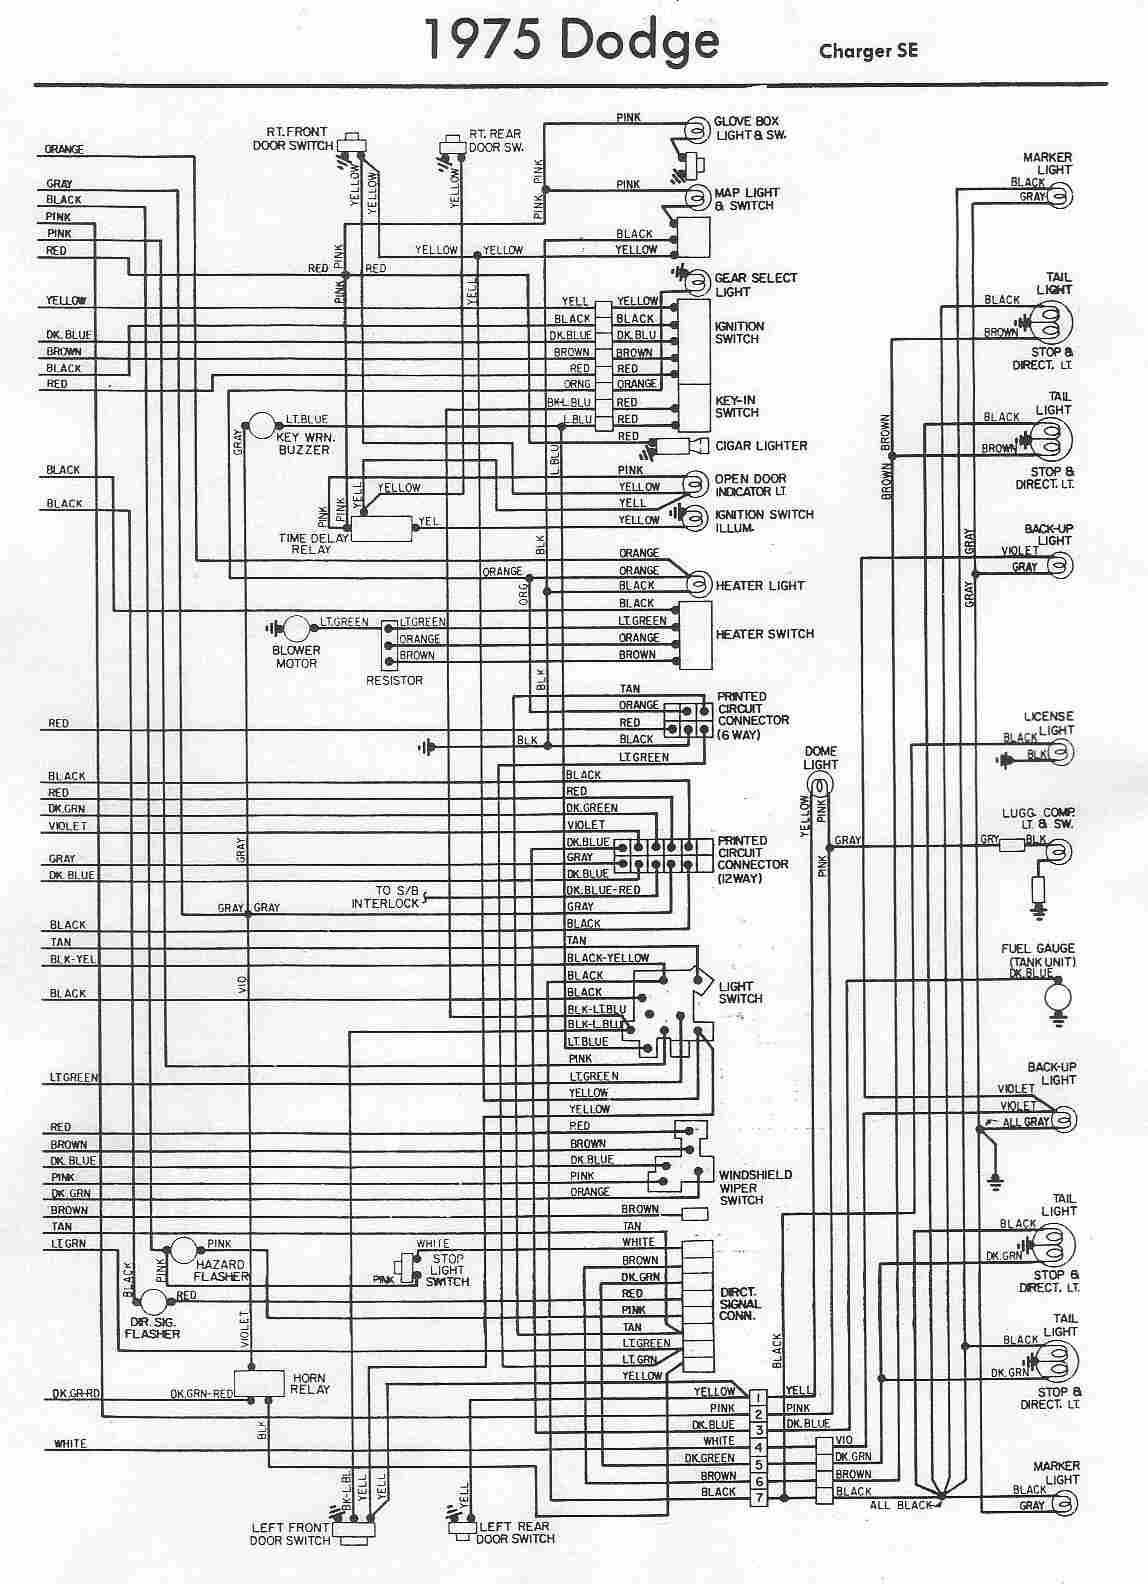 Dodge  car manuals, wiring diagrams PDF & fault codes